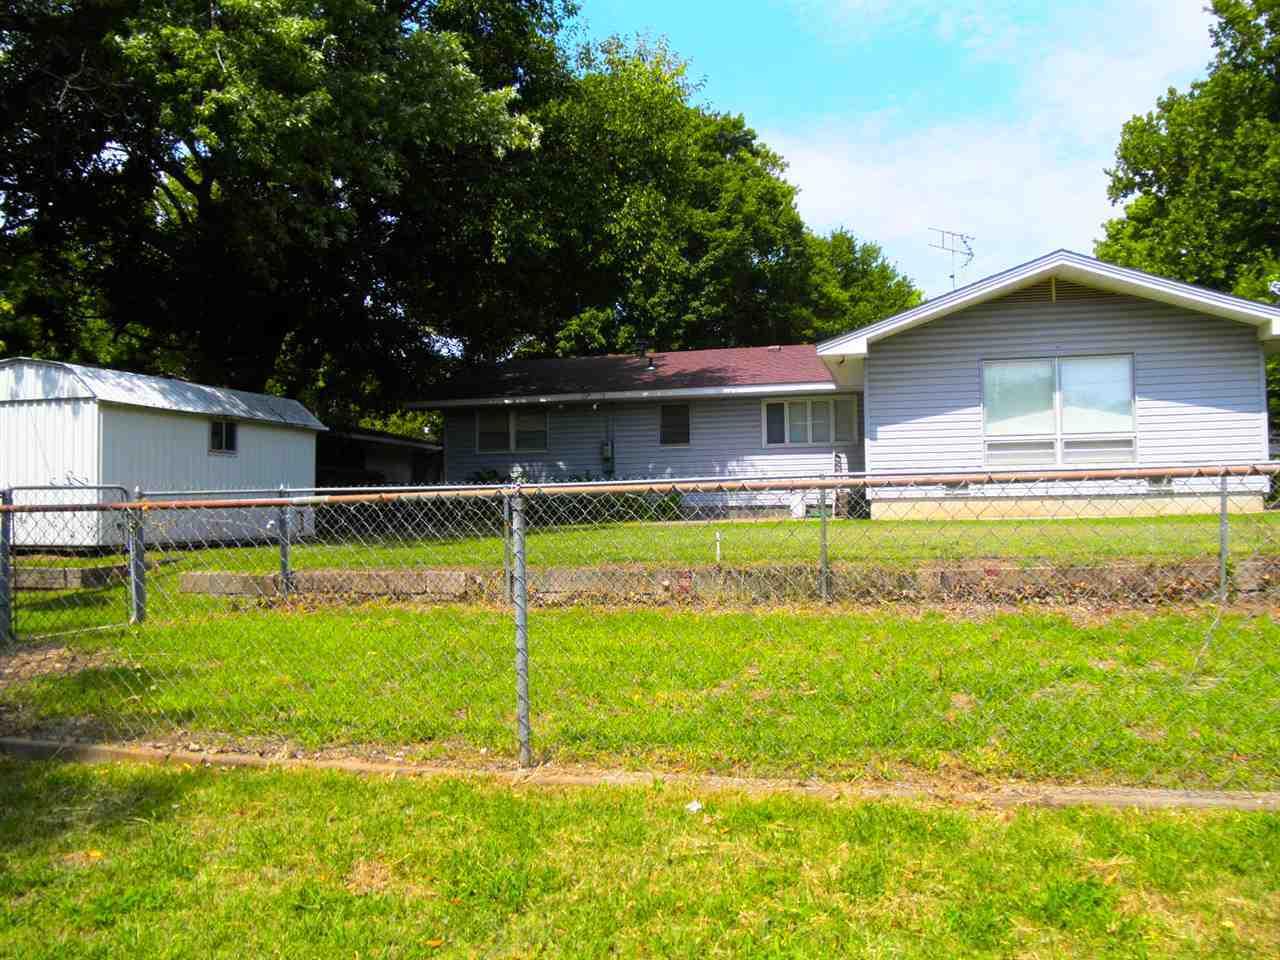 Sold Cross Sale W/ MLS | 1601 Blackard Ponca City, OK 74604 22